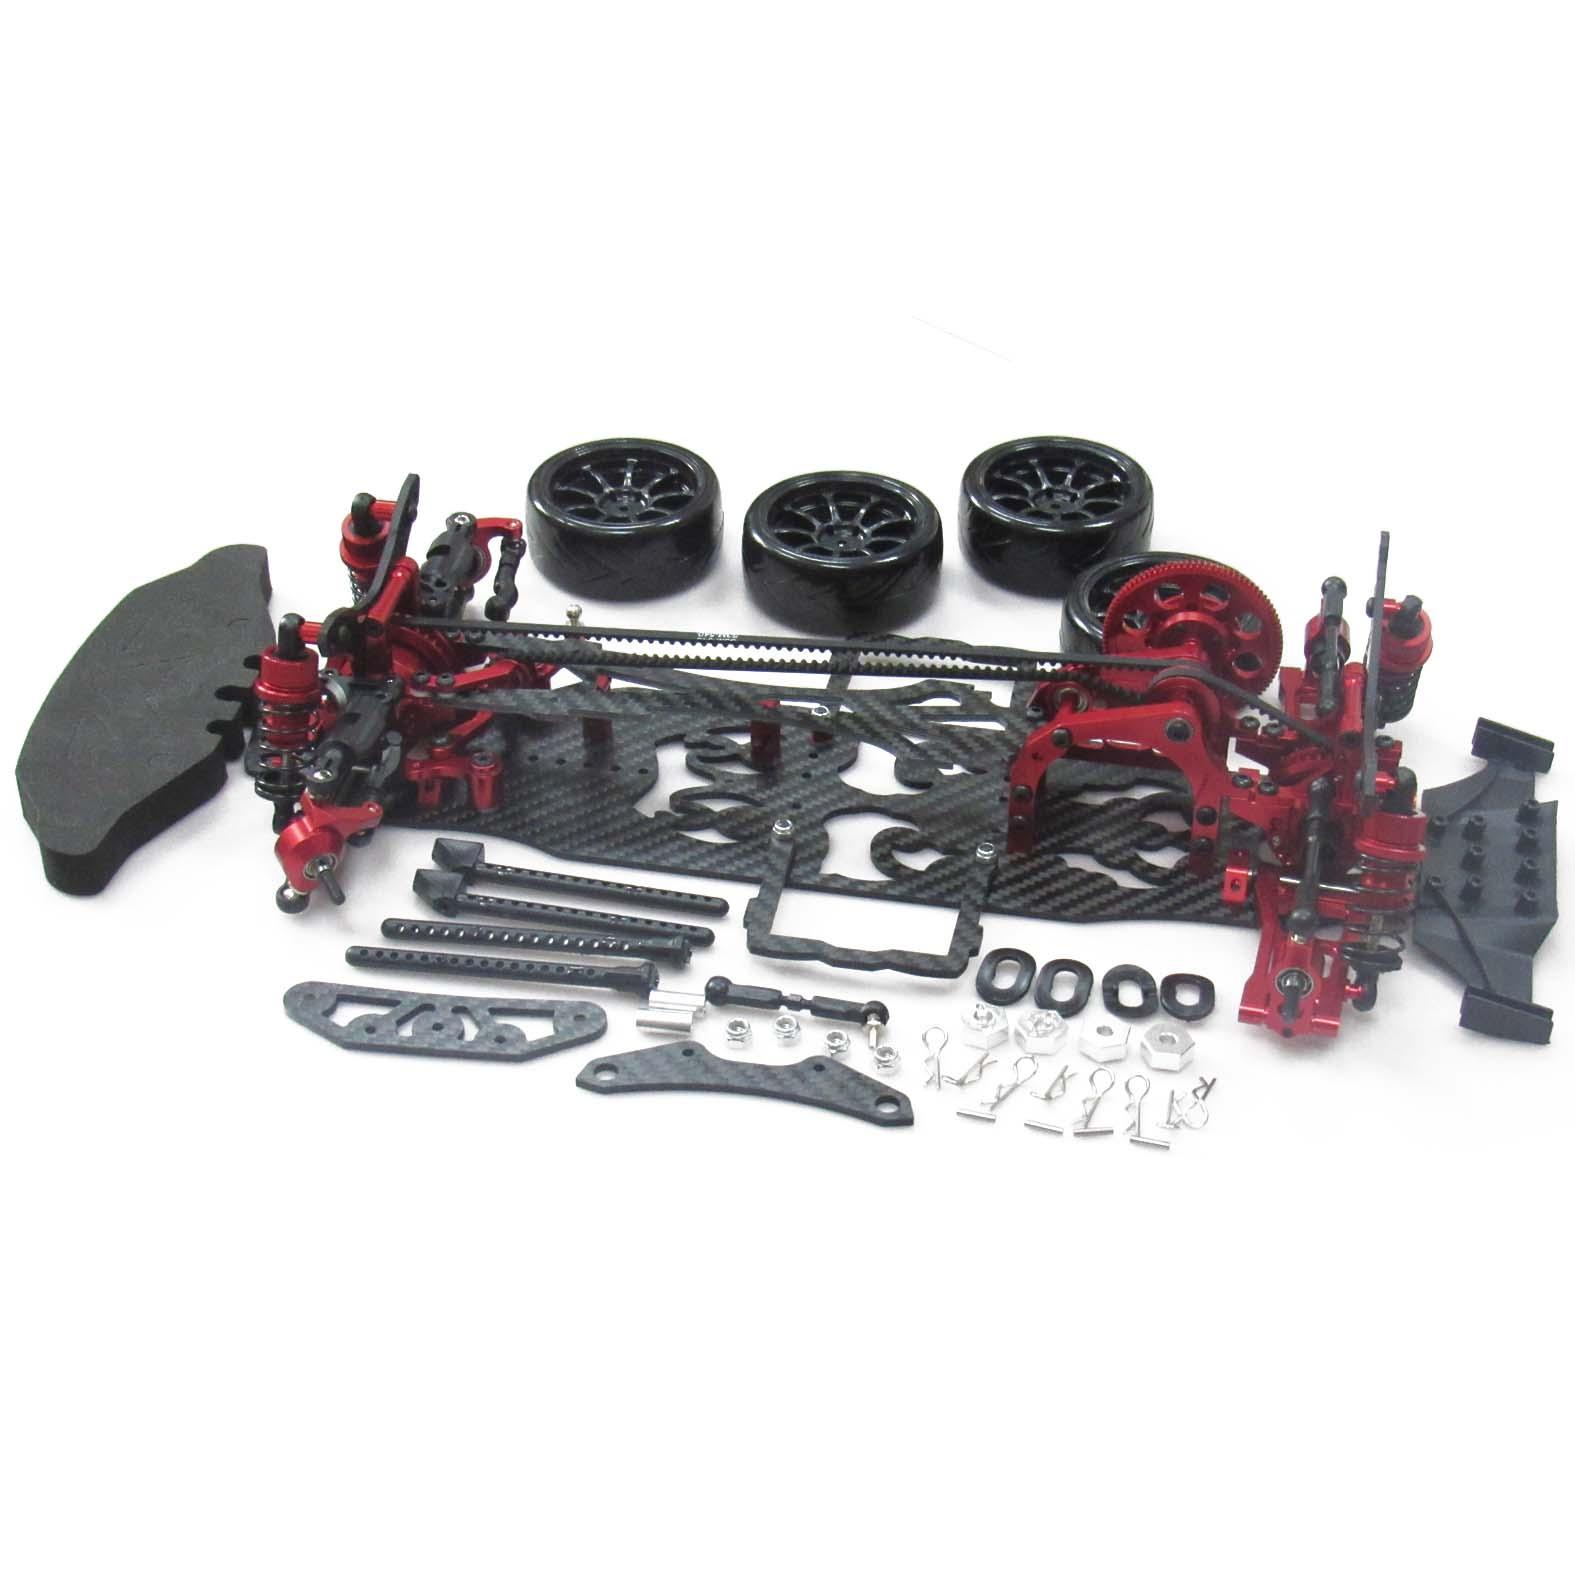 Alliage /& Carbone 1//10 SAKURA D3 Drift Racing Cadre /& SKYRC LEOPARD ESC Motor Combo Radio Control